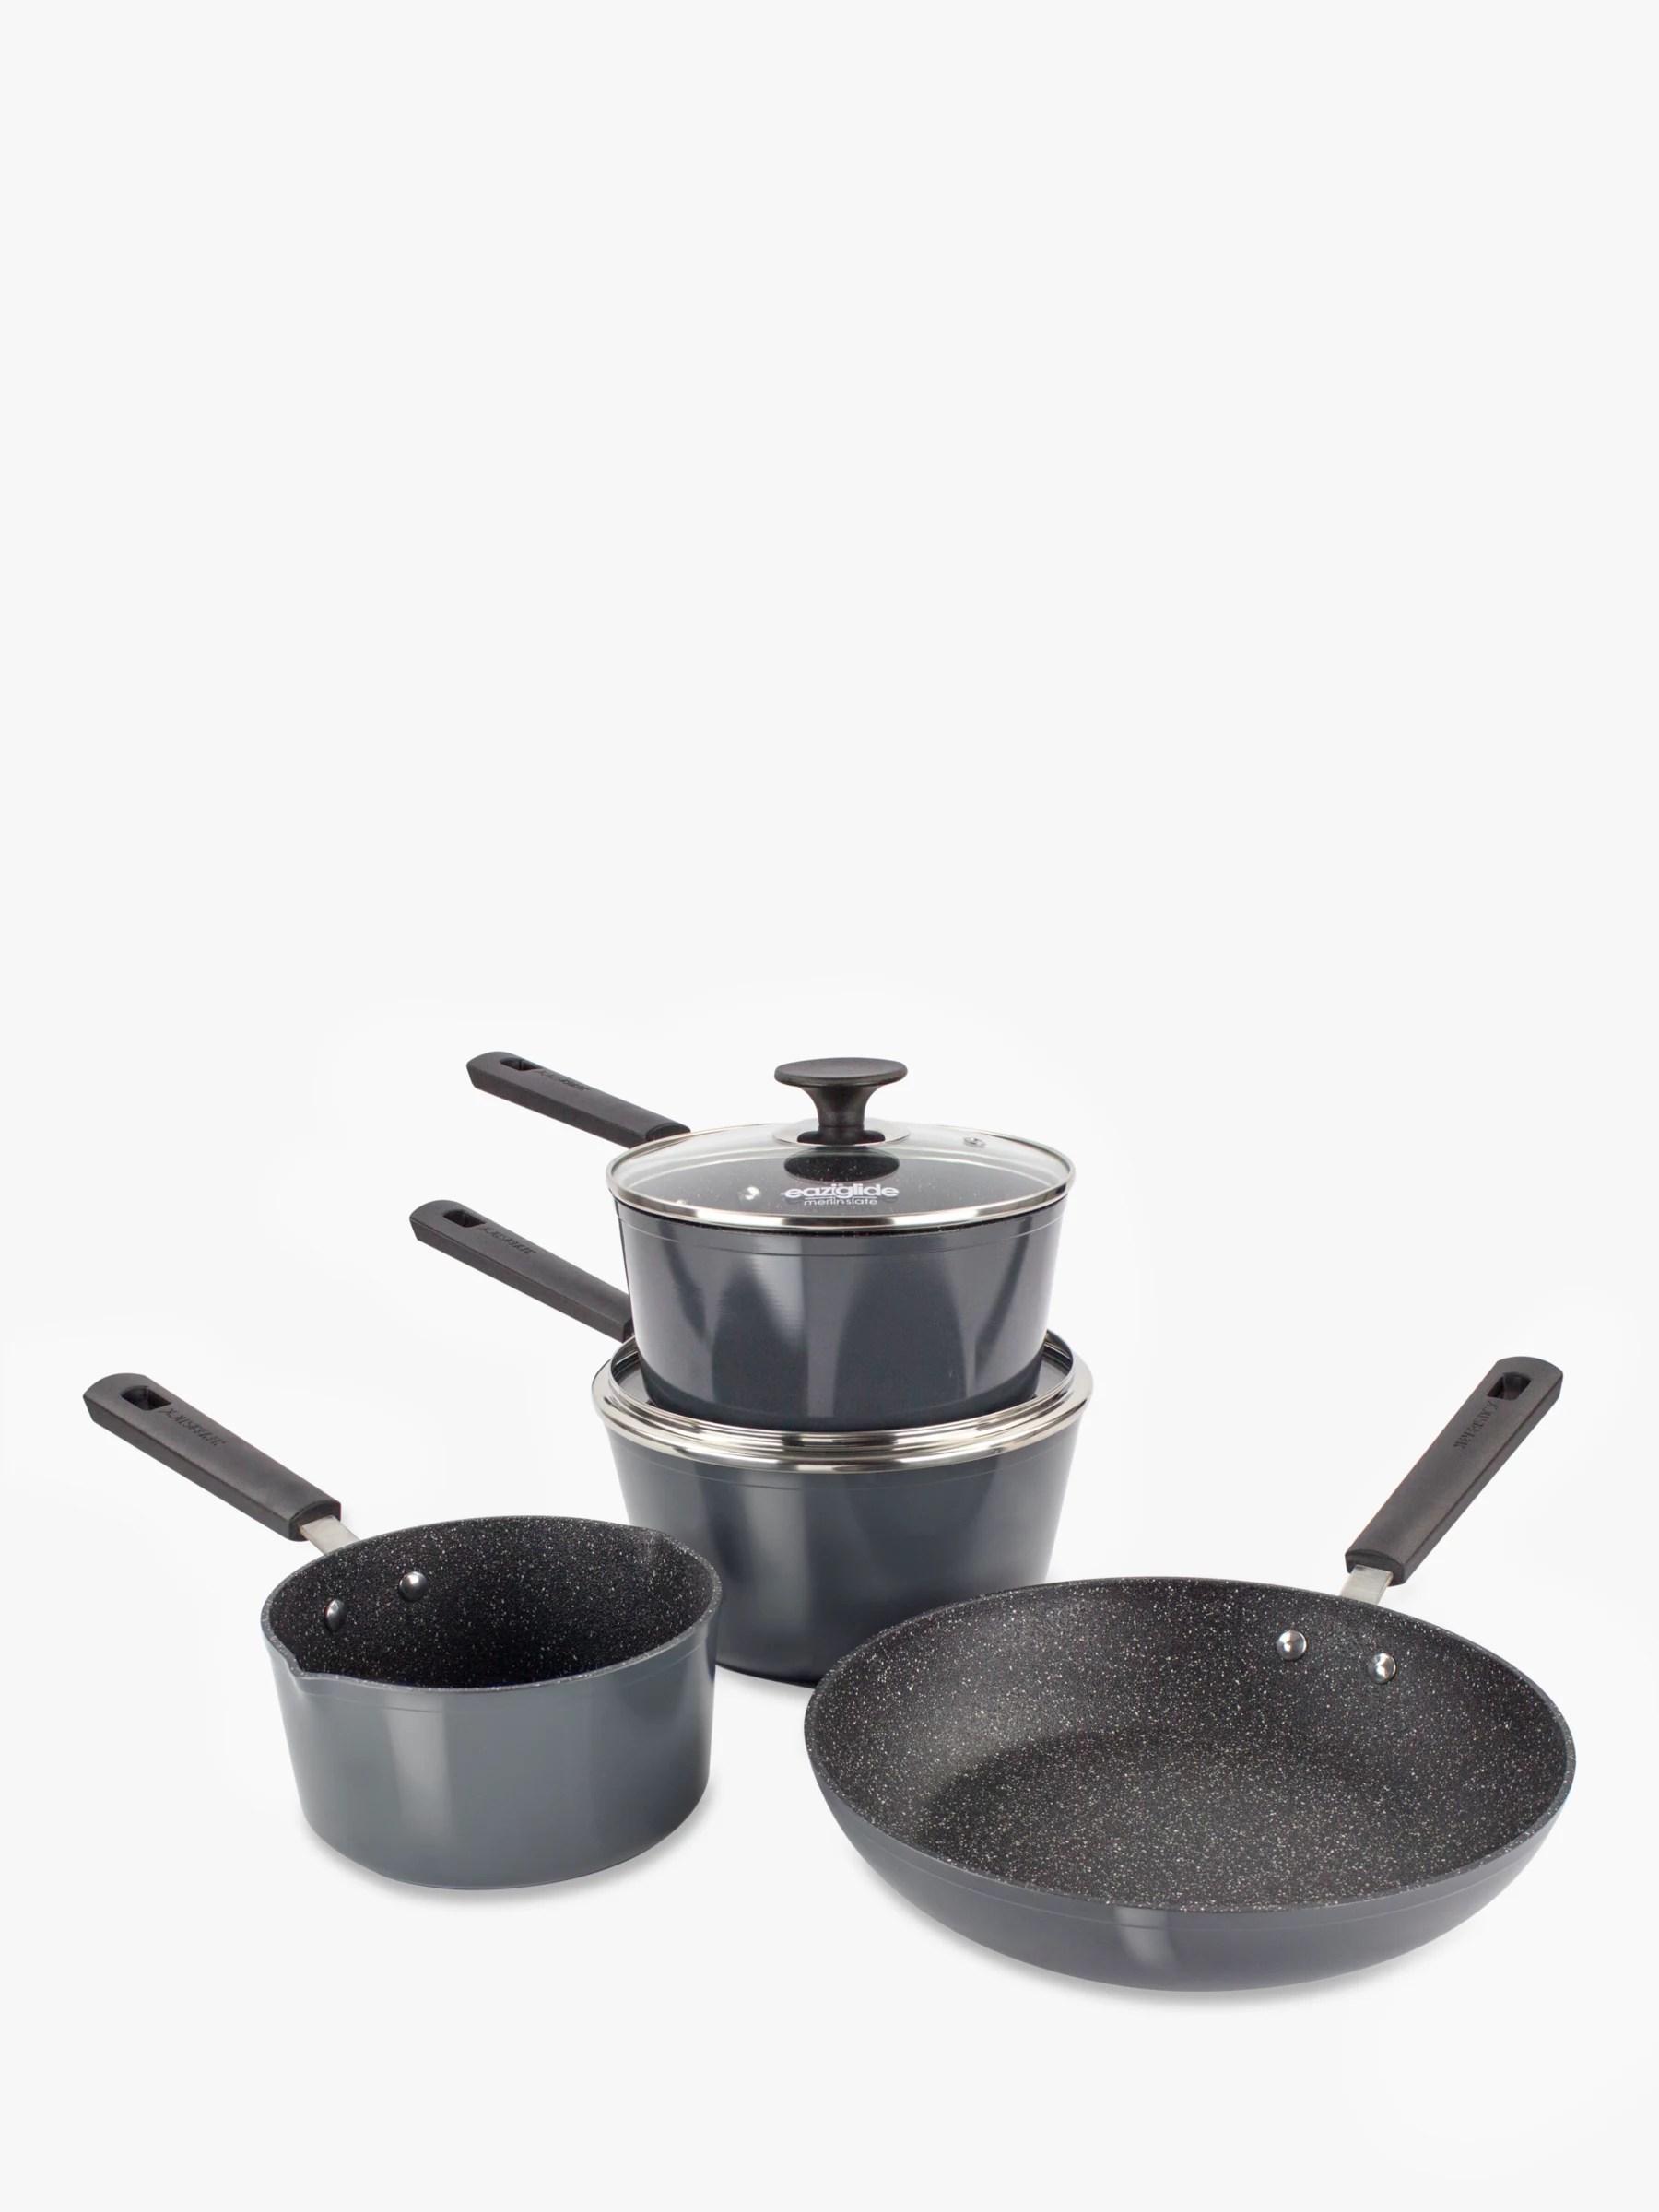 kitchen pan set cabinet hutch cookware sets pots and saucepan john lewis eaziglide neverstick non stick 4 piece black